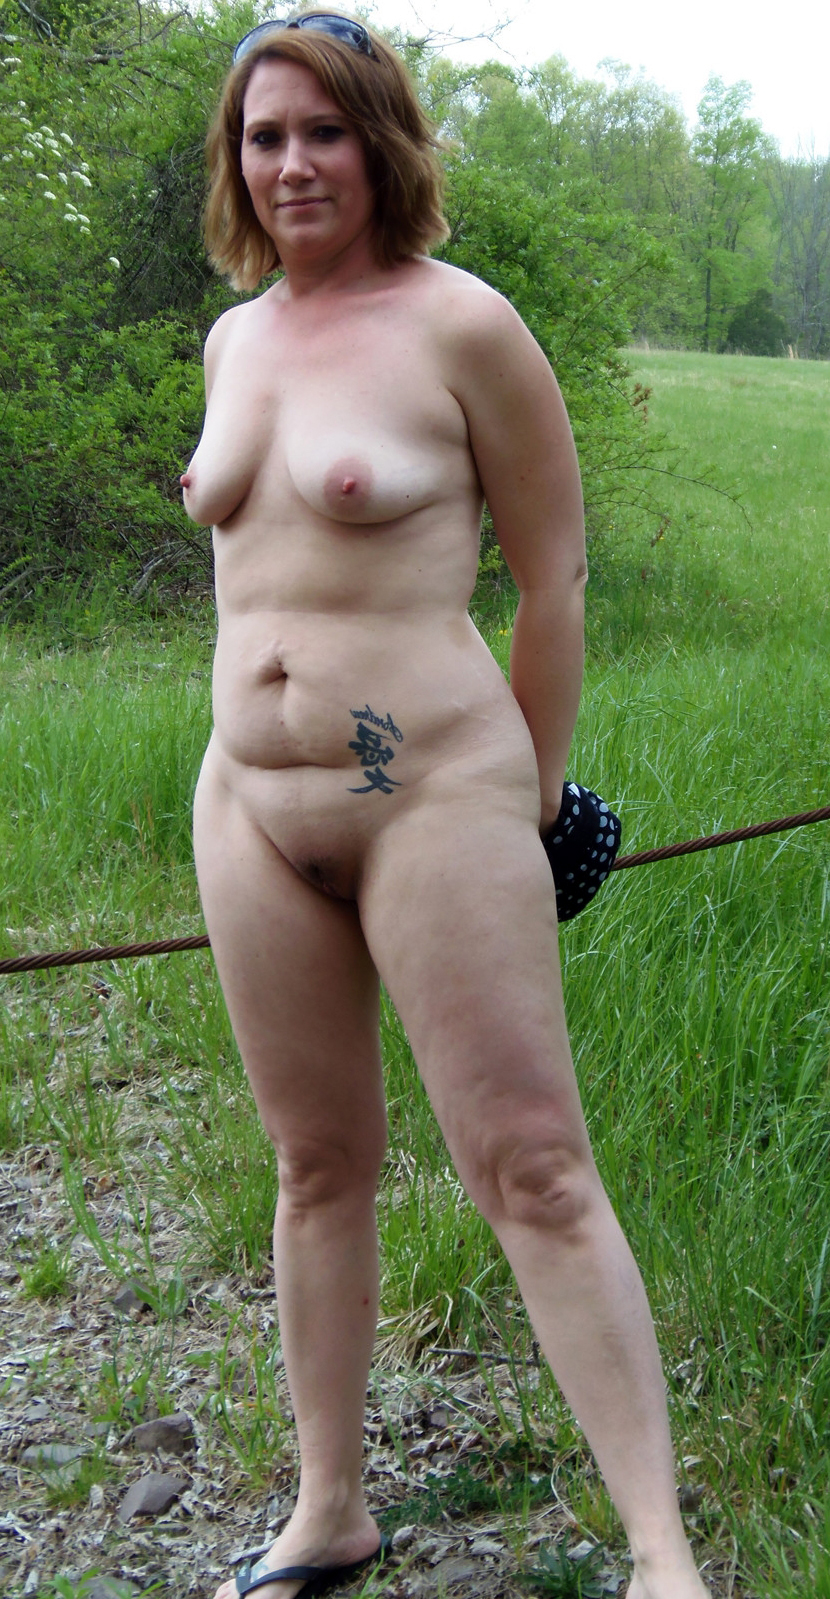 Tattos on battalion posing nude